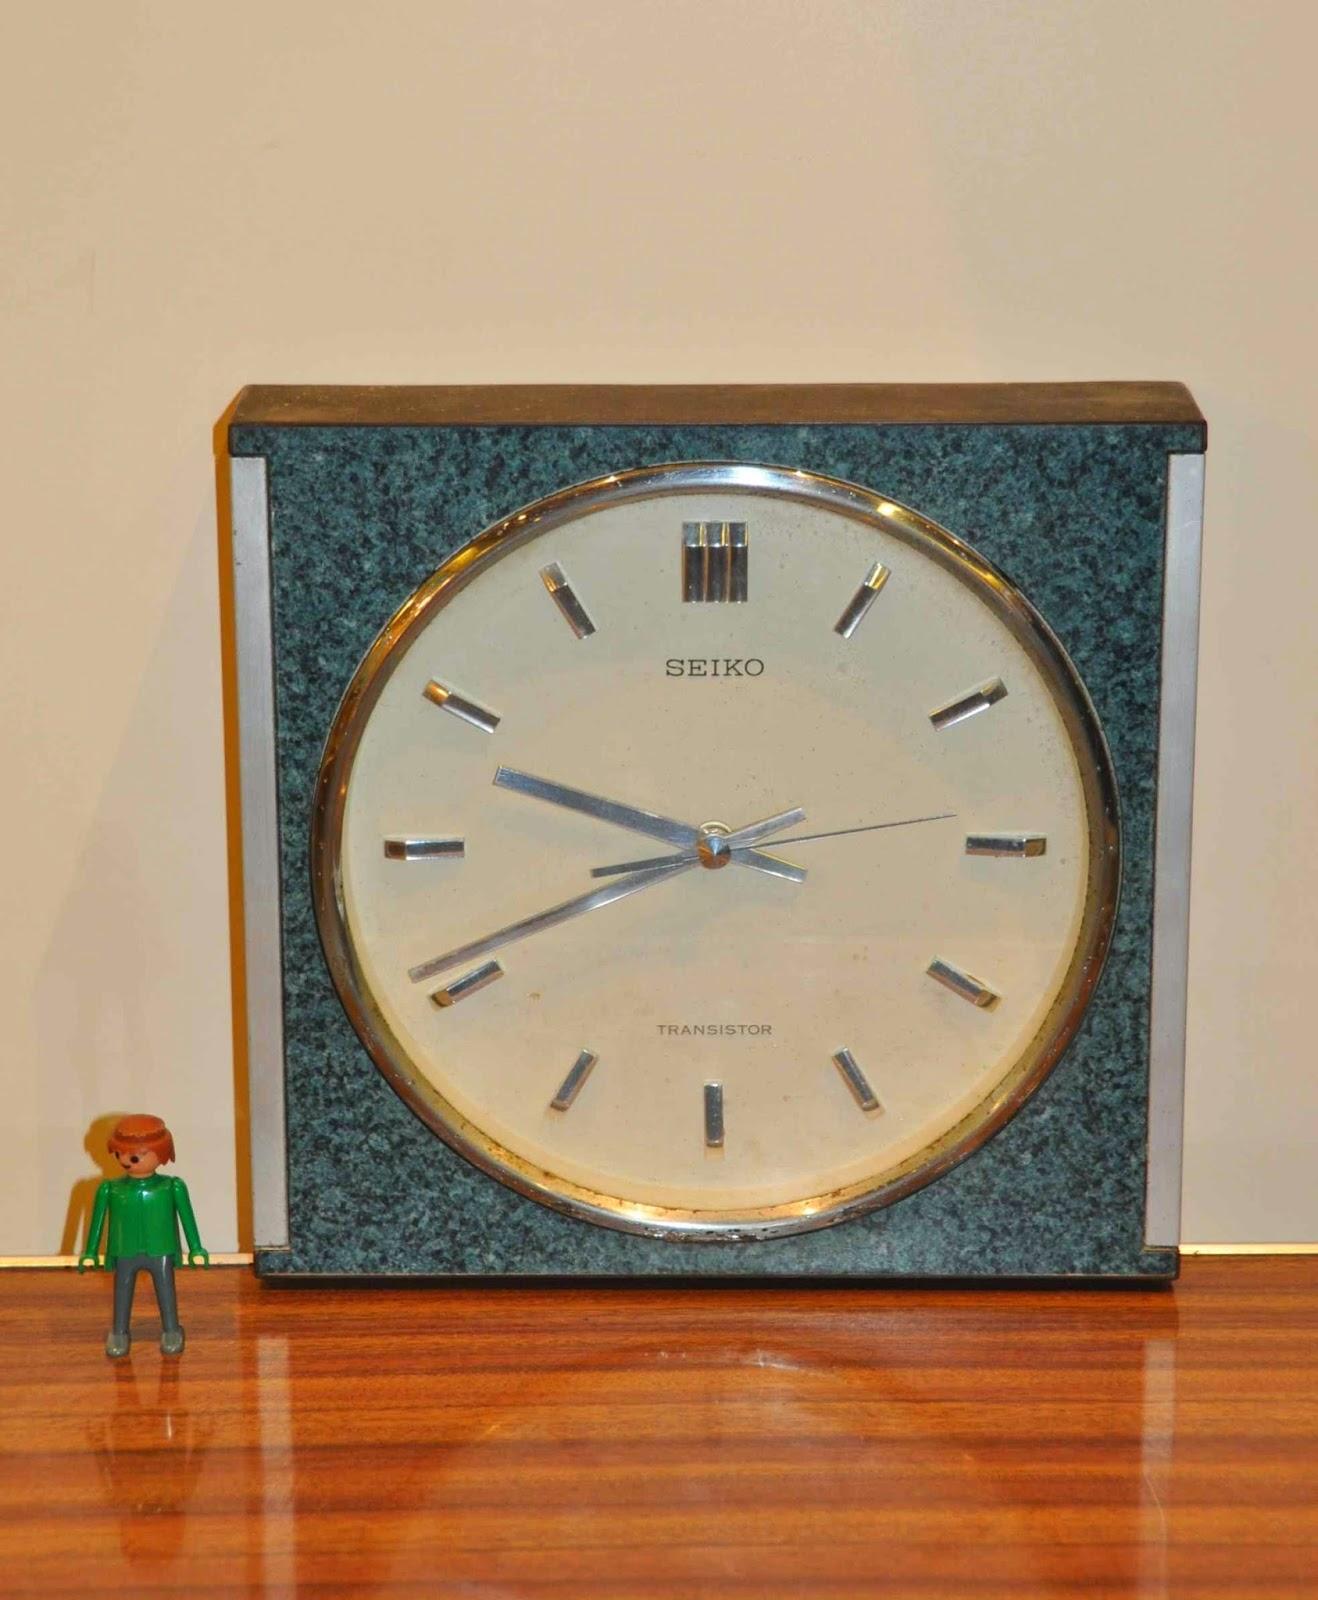 Reloj de pared seiko vintage jacoboansin - Relojes vintage de pared ...